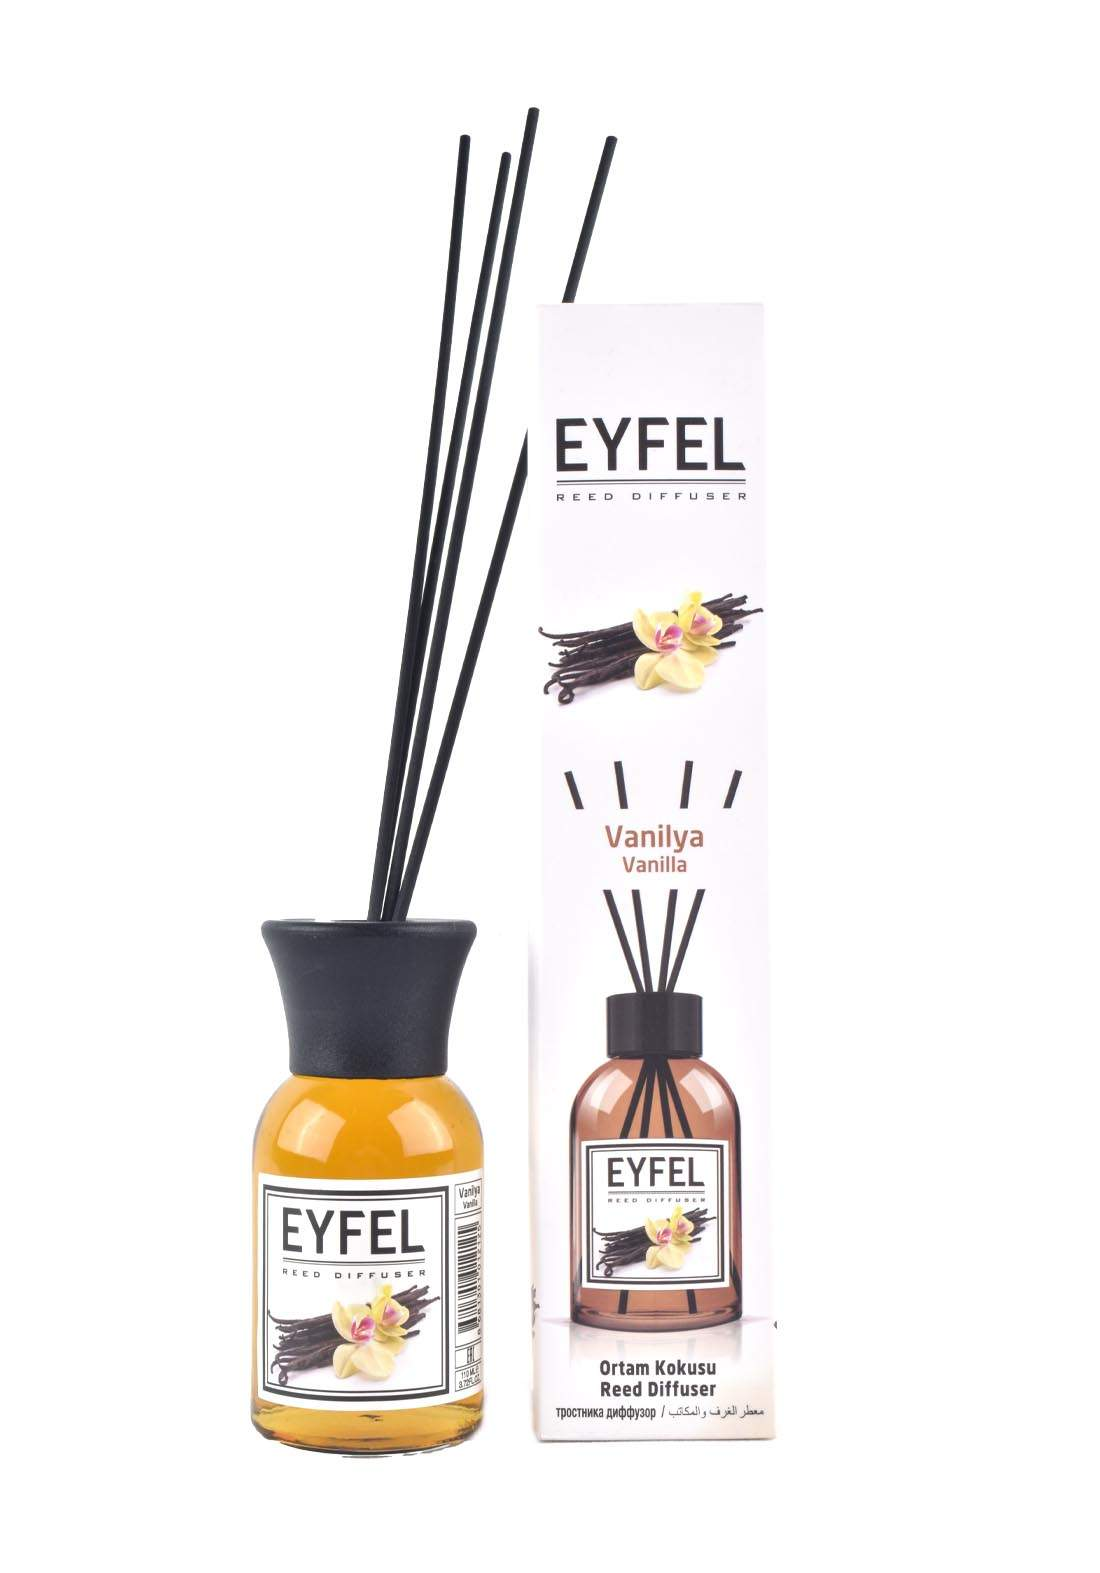 Eyfel Reed Diffuser Vanilla معطر جو برائحة الفانيلا